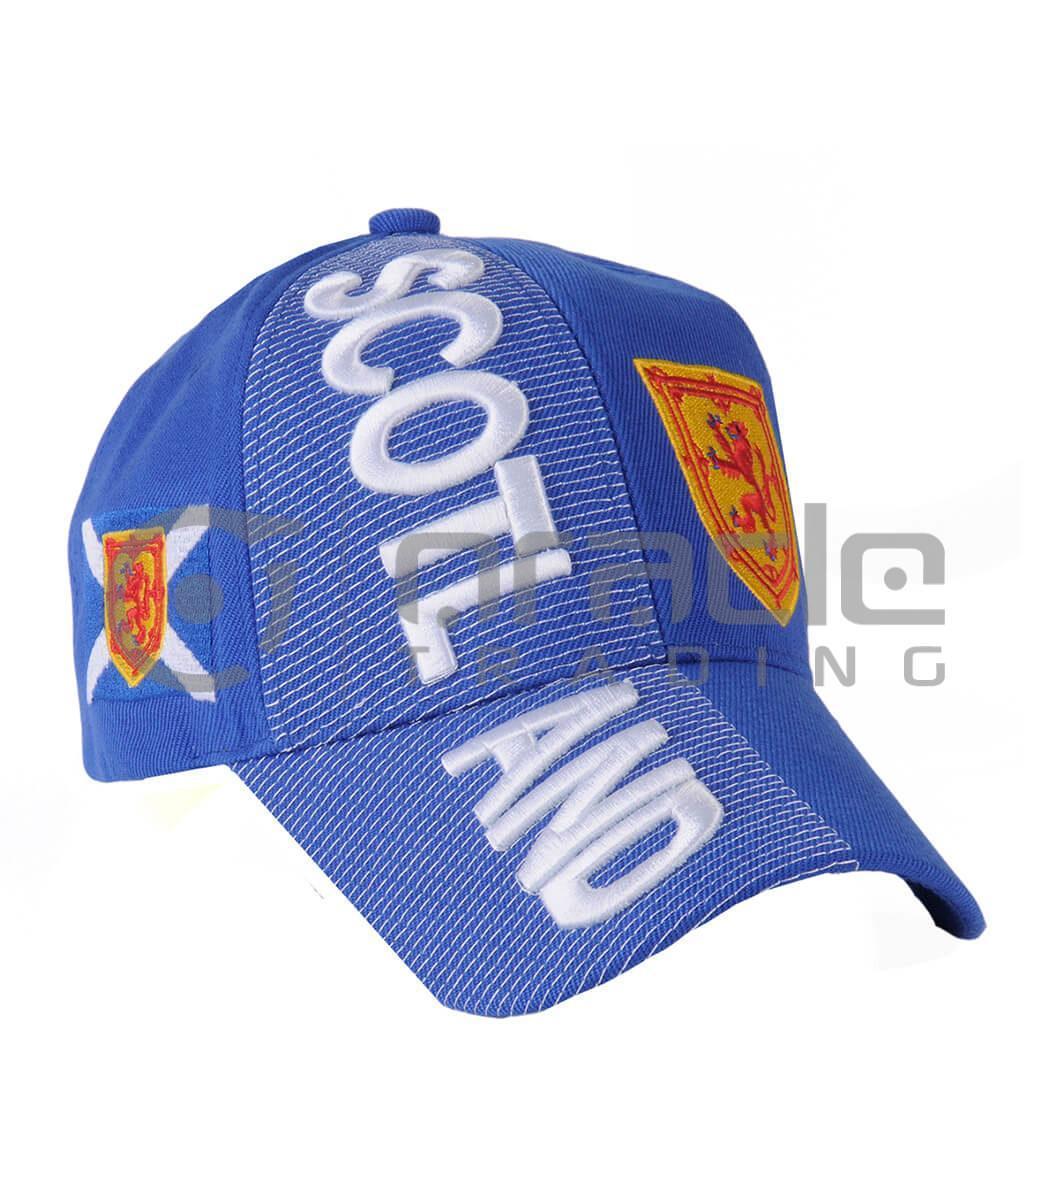 3D Scotland Hat - Rampant Lion